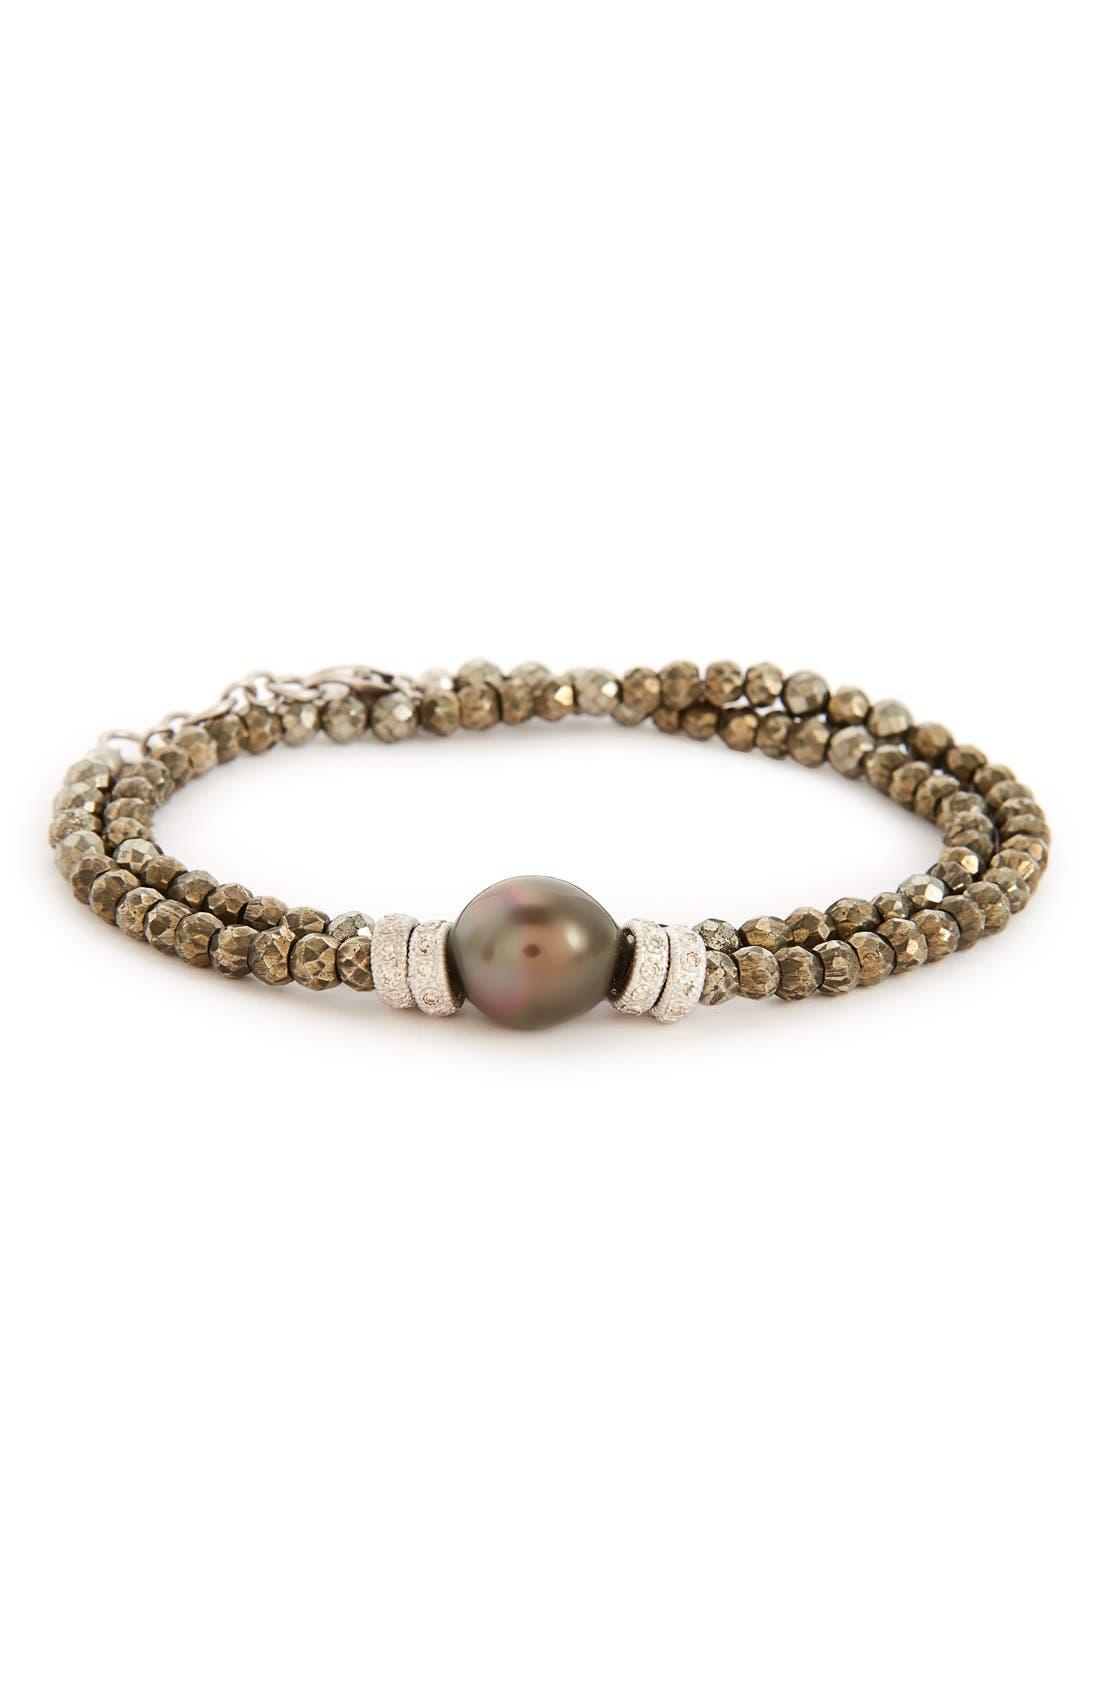 Old World Semiprecious Stone & Diamond Beaded Bracelet,                             Main thumbnail 1, color,                             SILVER